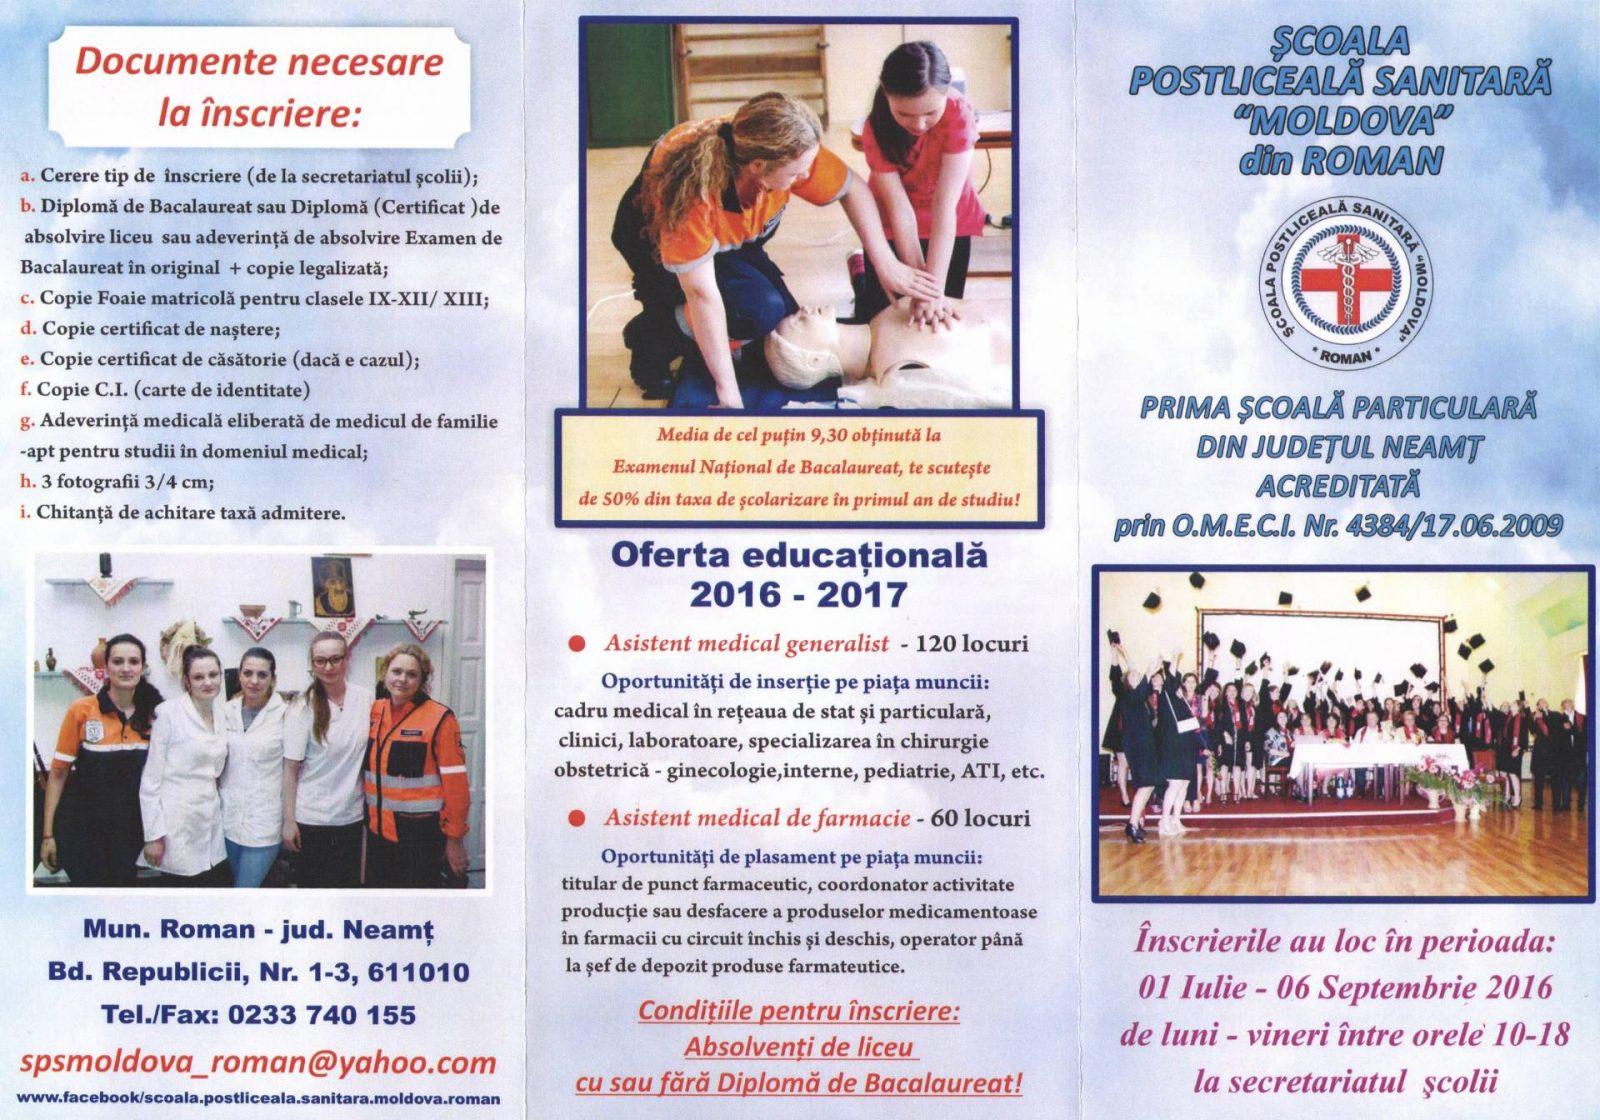 Oferta educationala Scoala Postliceala Sanitara Moldova